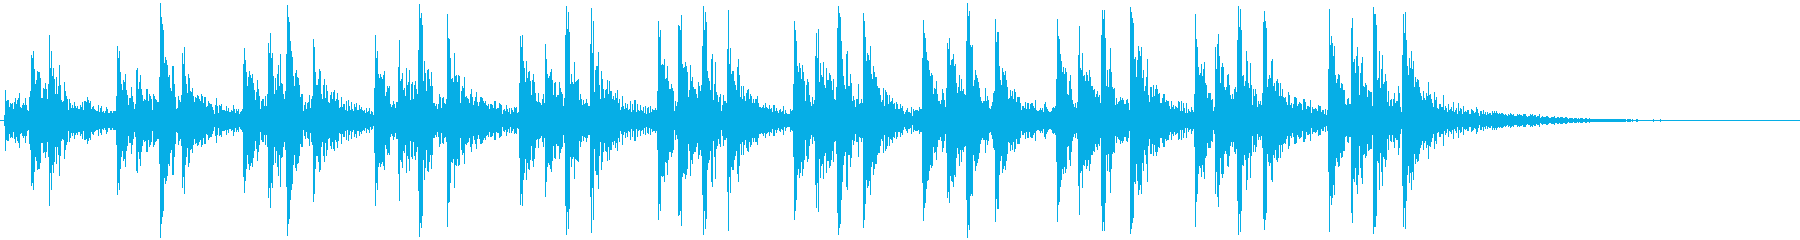 LOW TOMS:クランキーホース...の再生済みの波形